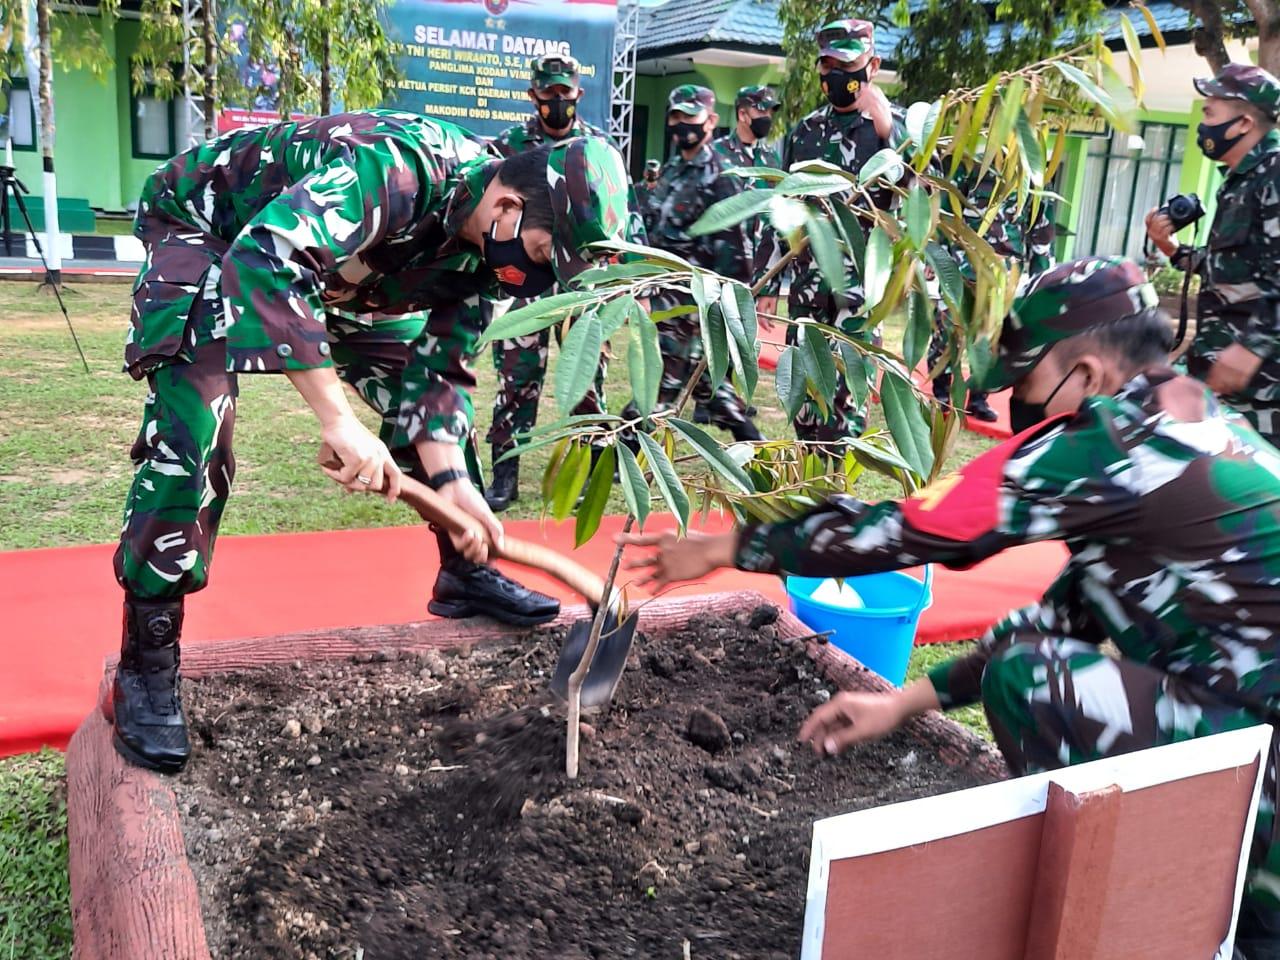 Kunker Perdana Pangdam VI Ke Kutim, Mayjen Heri Wiranto : Landscape Bukit Pelangi Sangat Megah